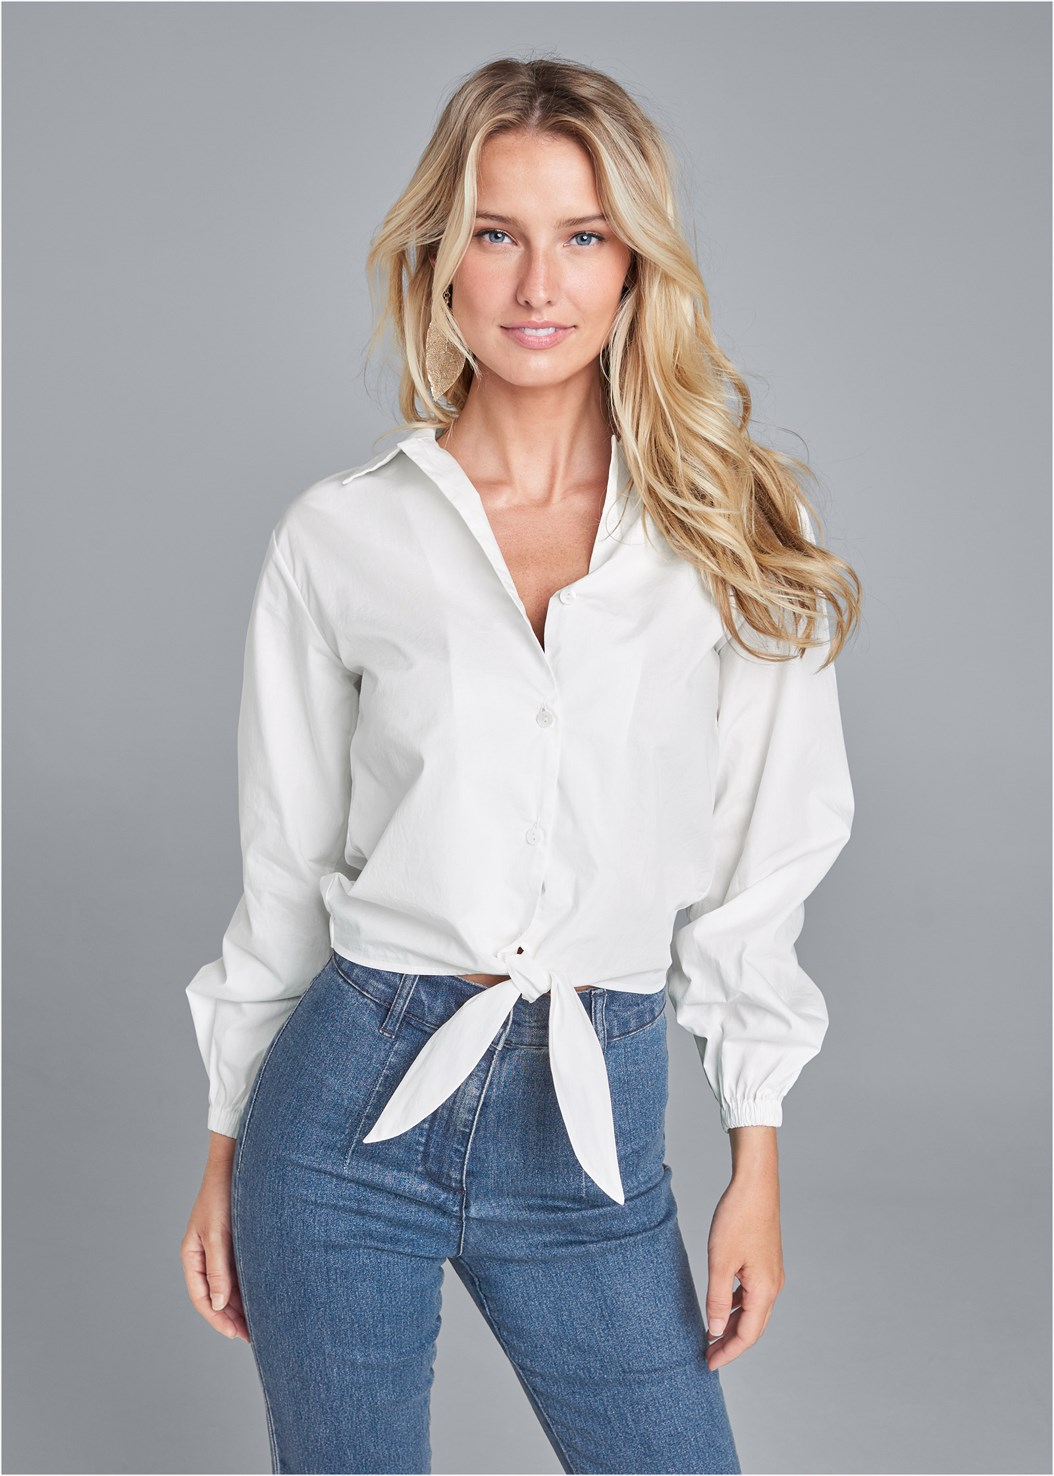 Button Up Tie Front Blouse